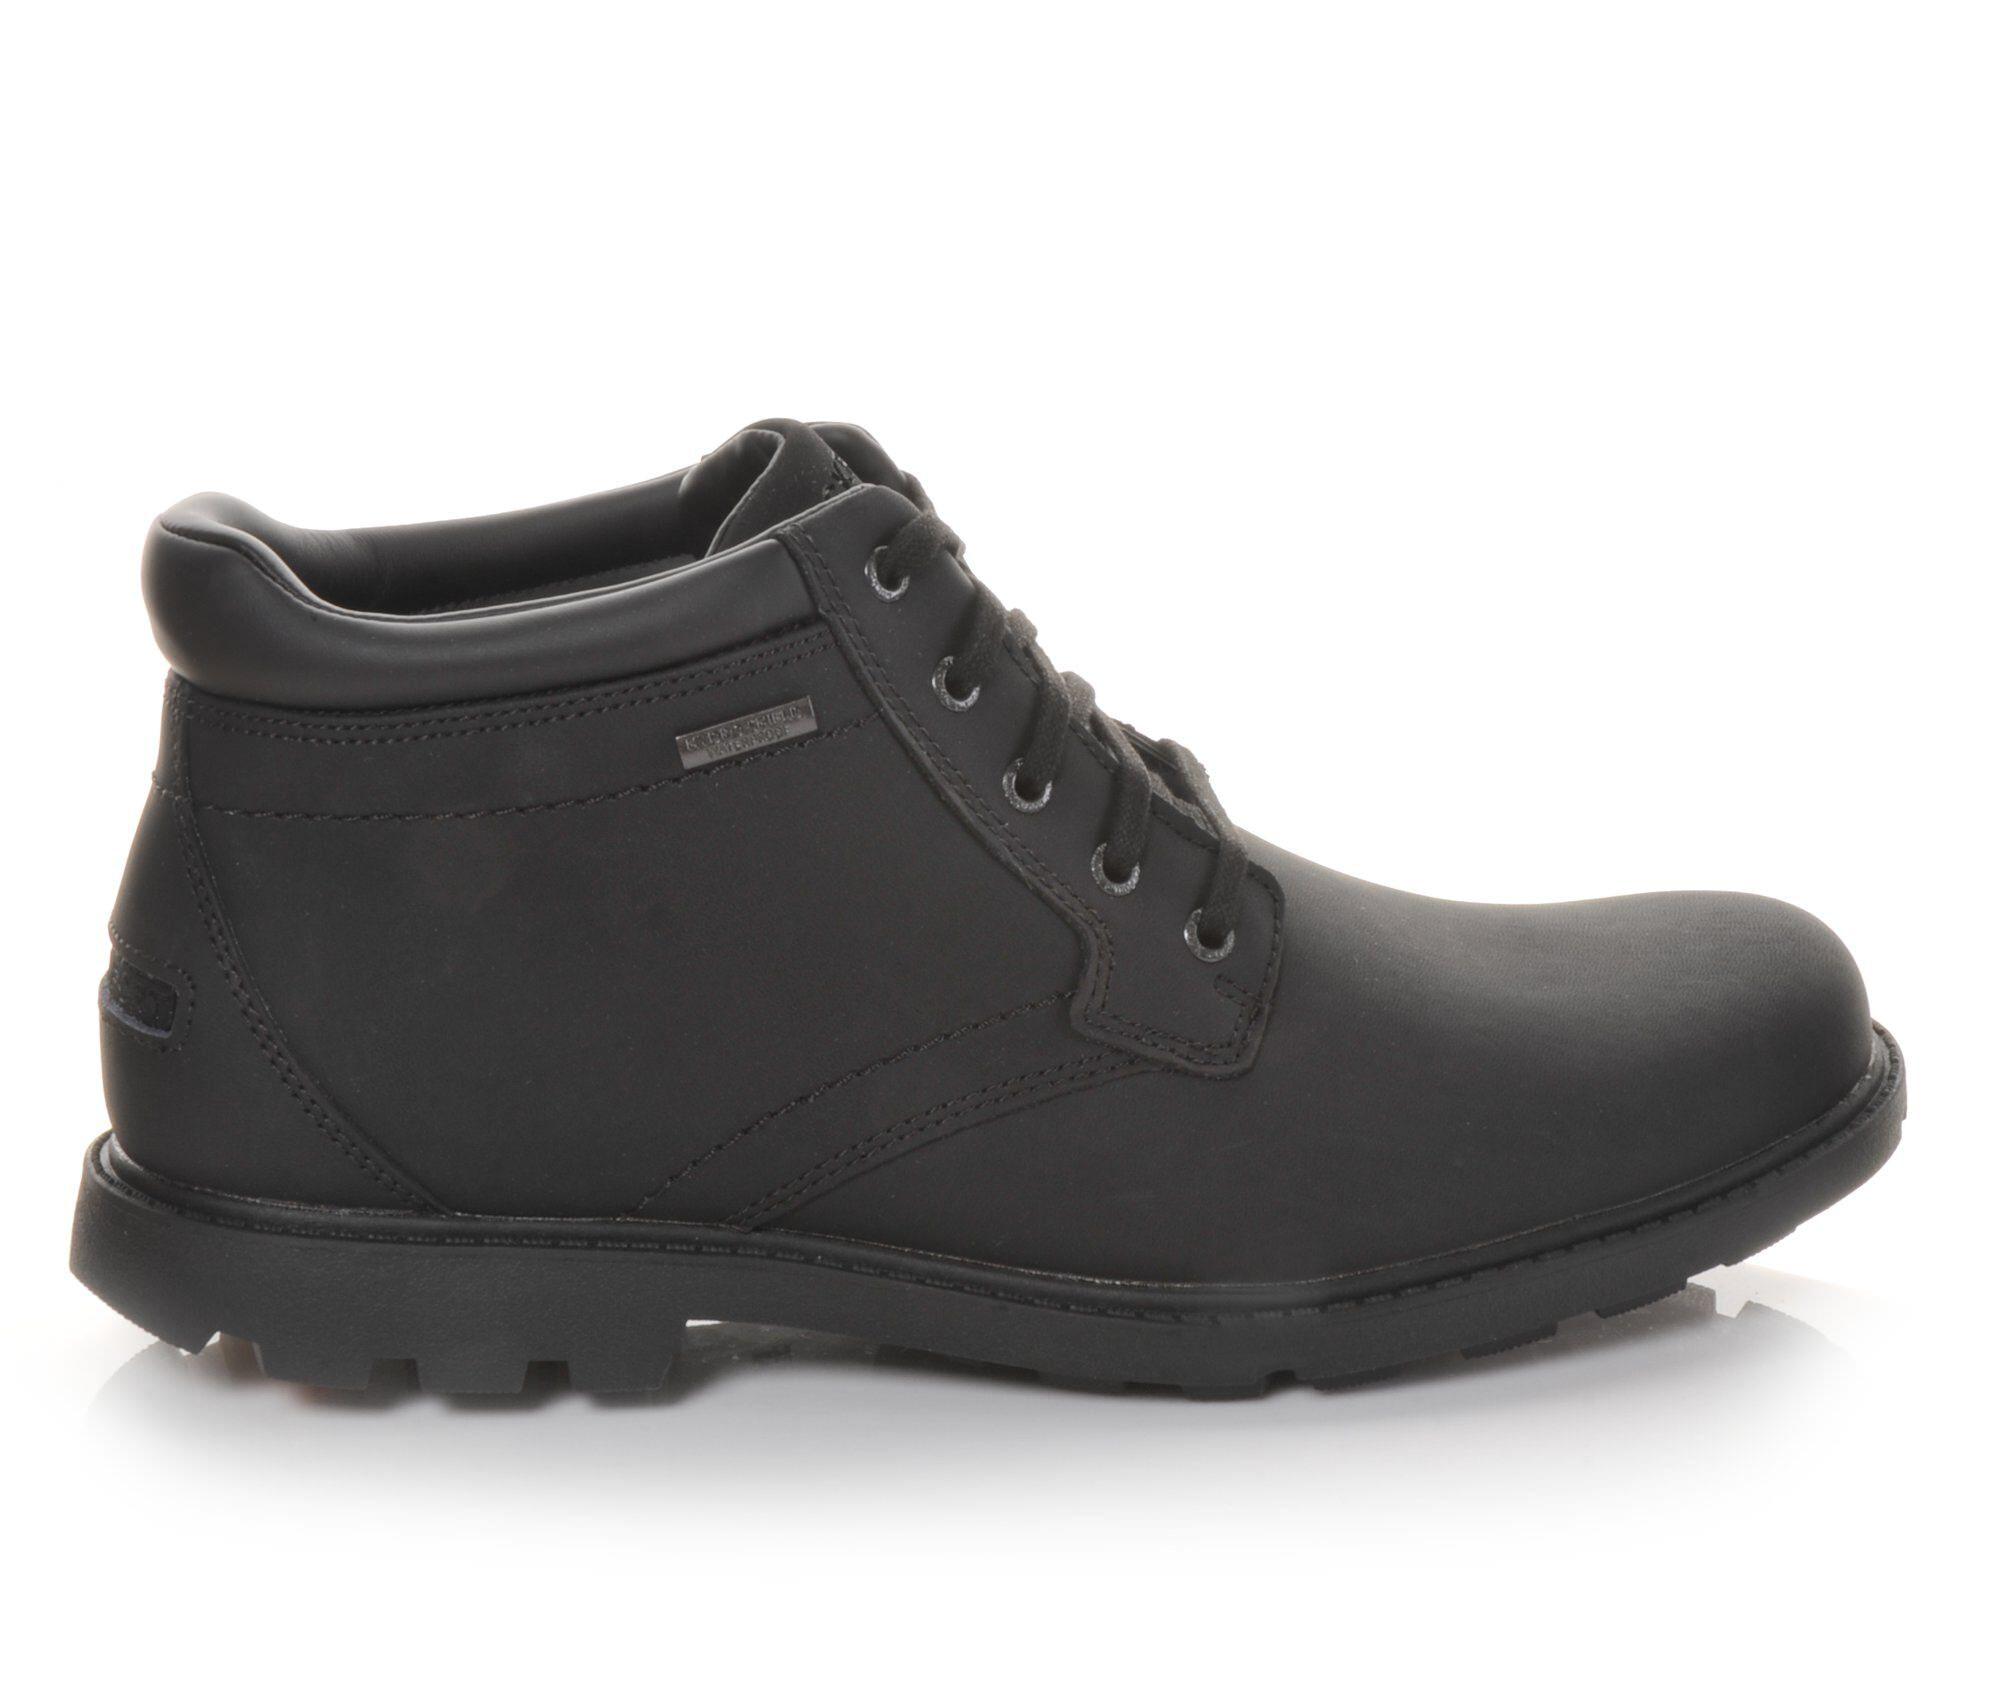 uk shoes_kd1030